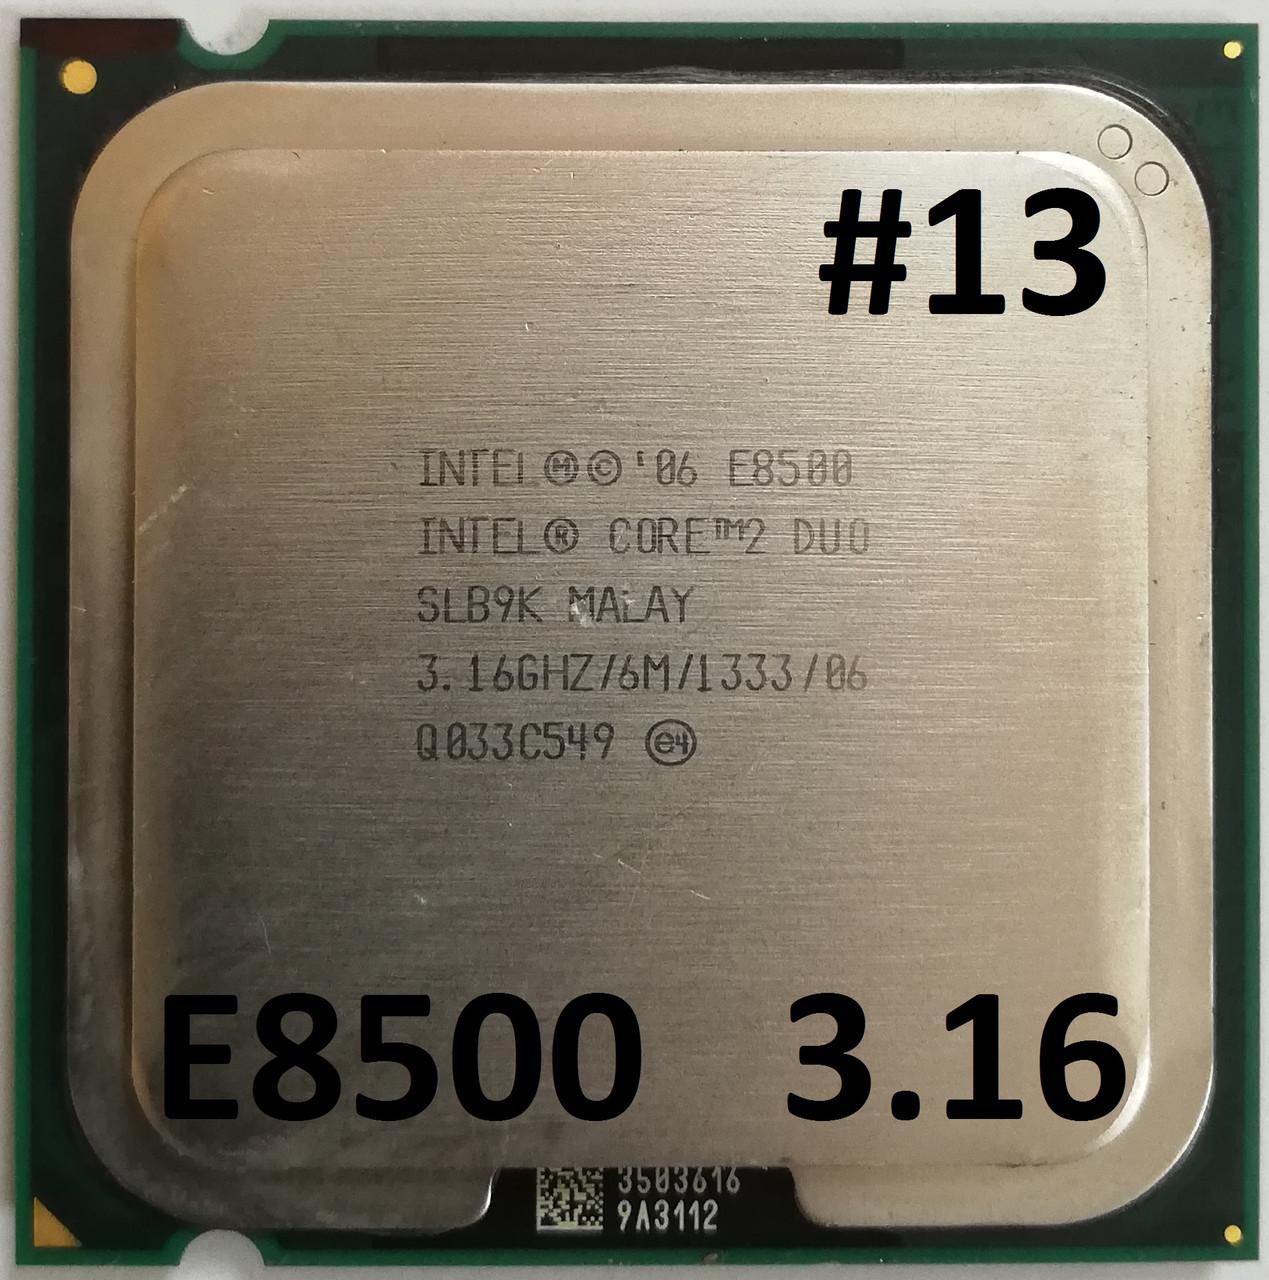 Процессор ЛОТ #13 Intel Core 2 Duo E8500 E0 SLB9K 3.16 GHz 6 MB Cache 1333 MHz FSB Socket 775 Б/У